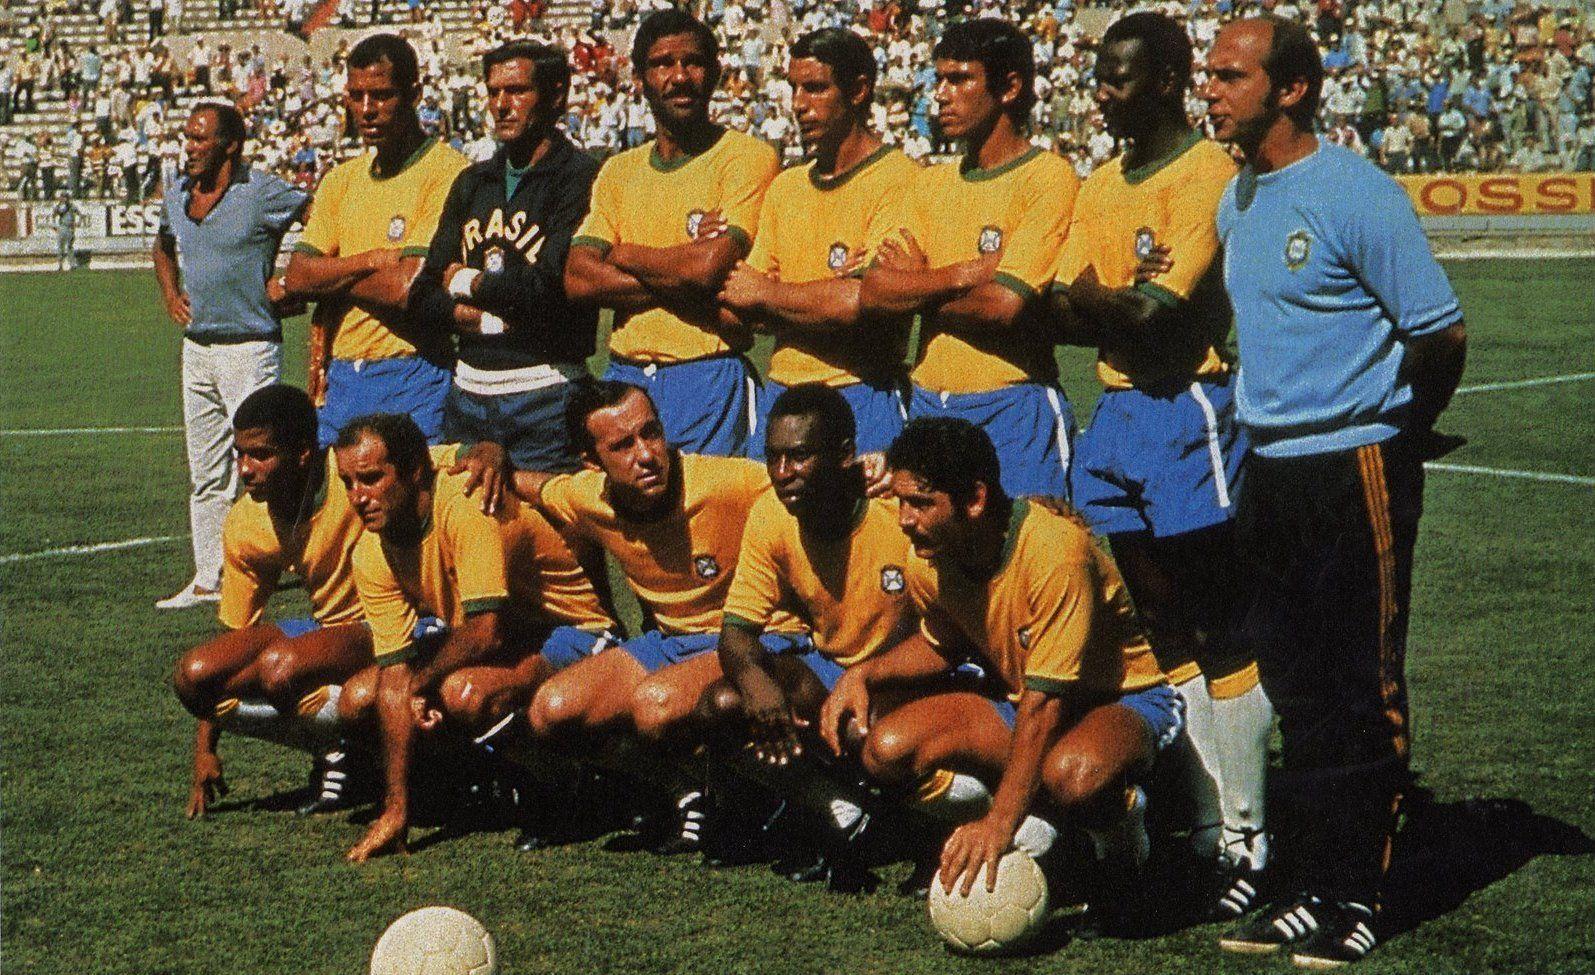 SELEÇÃO BRASILEIRA DE 70 | Seleção brasileira, Seleção brasileira ...